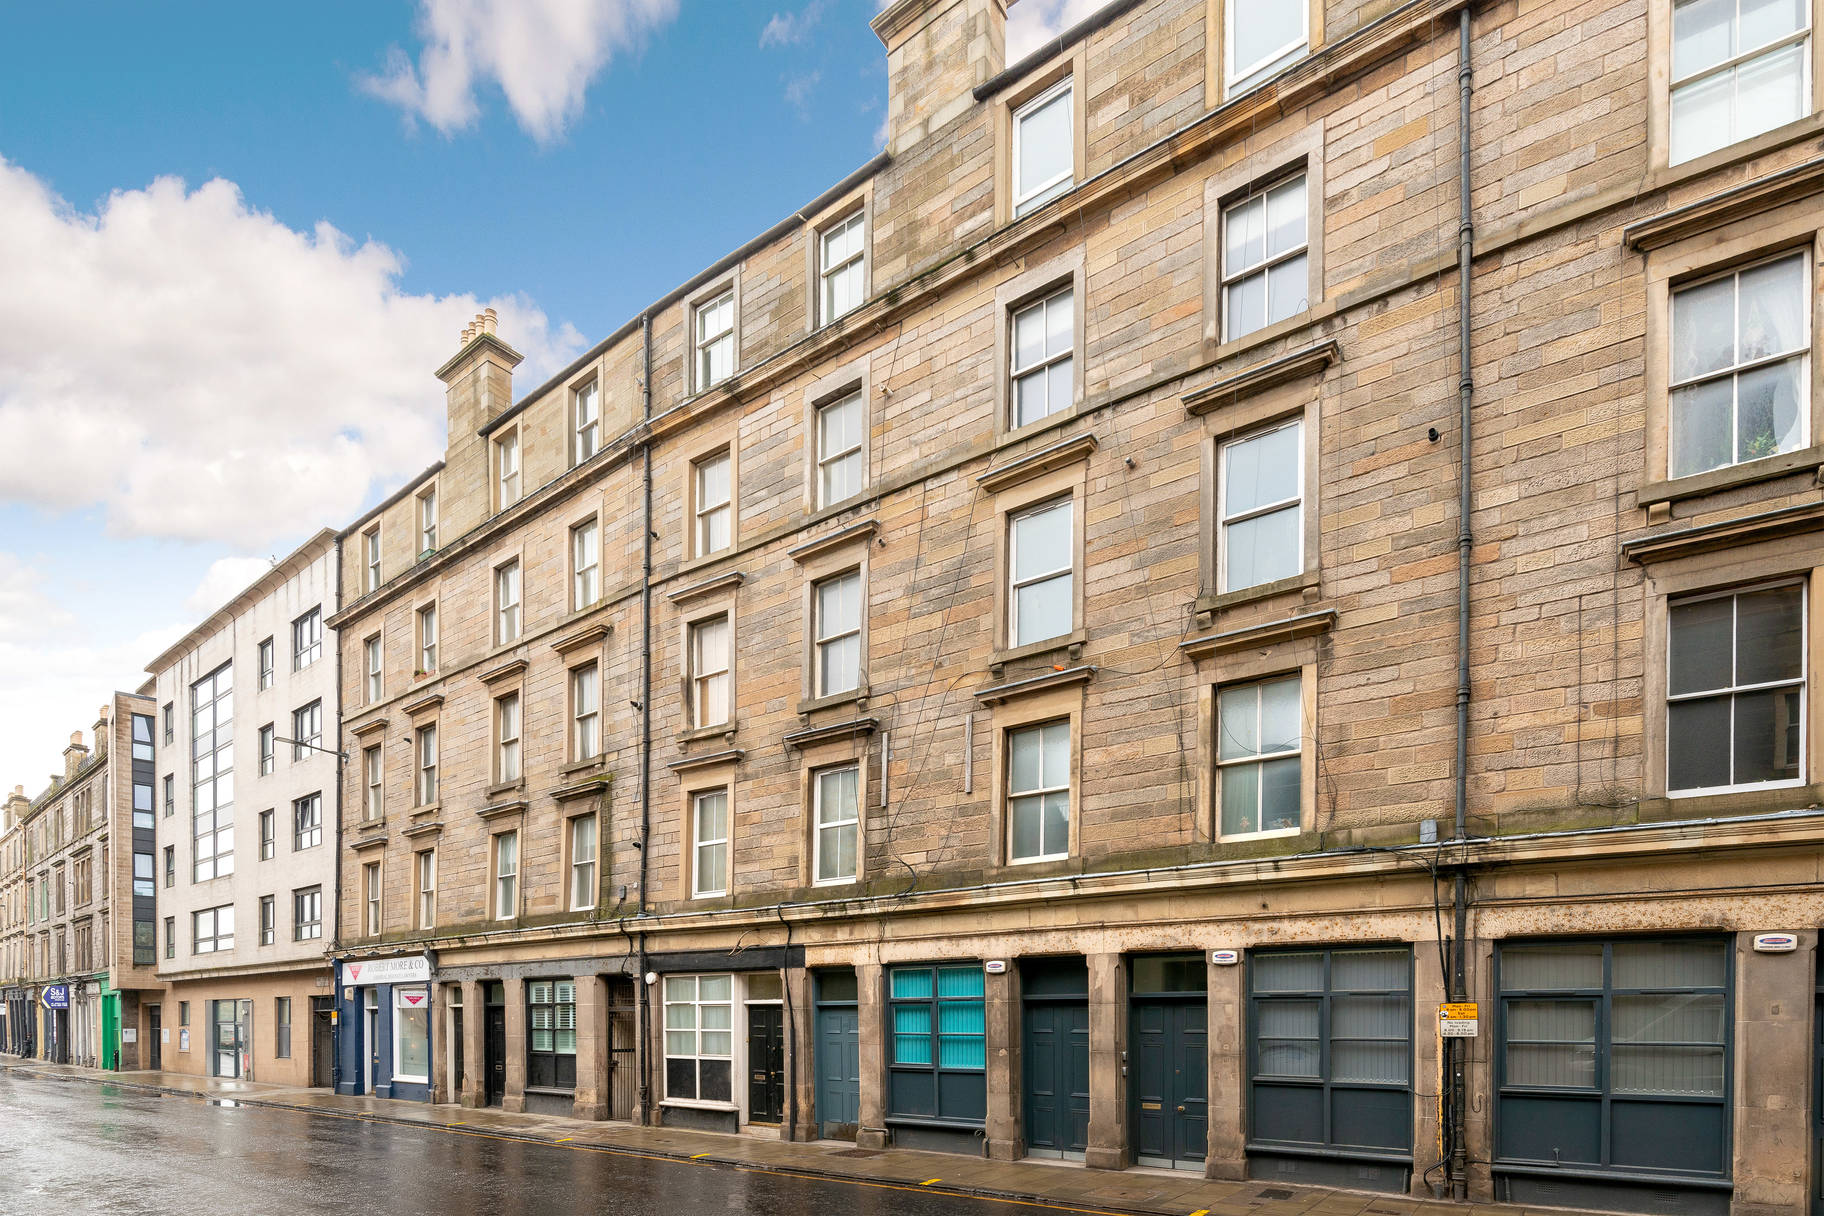 96 (PF) Duke Street, Leith, Edinburgh, EH6 8HL